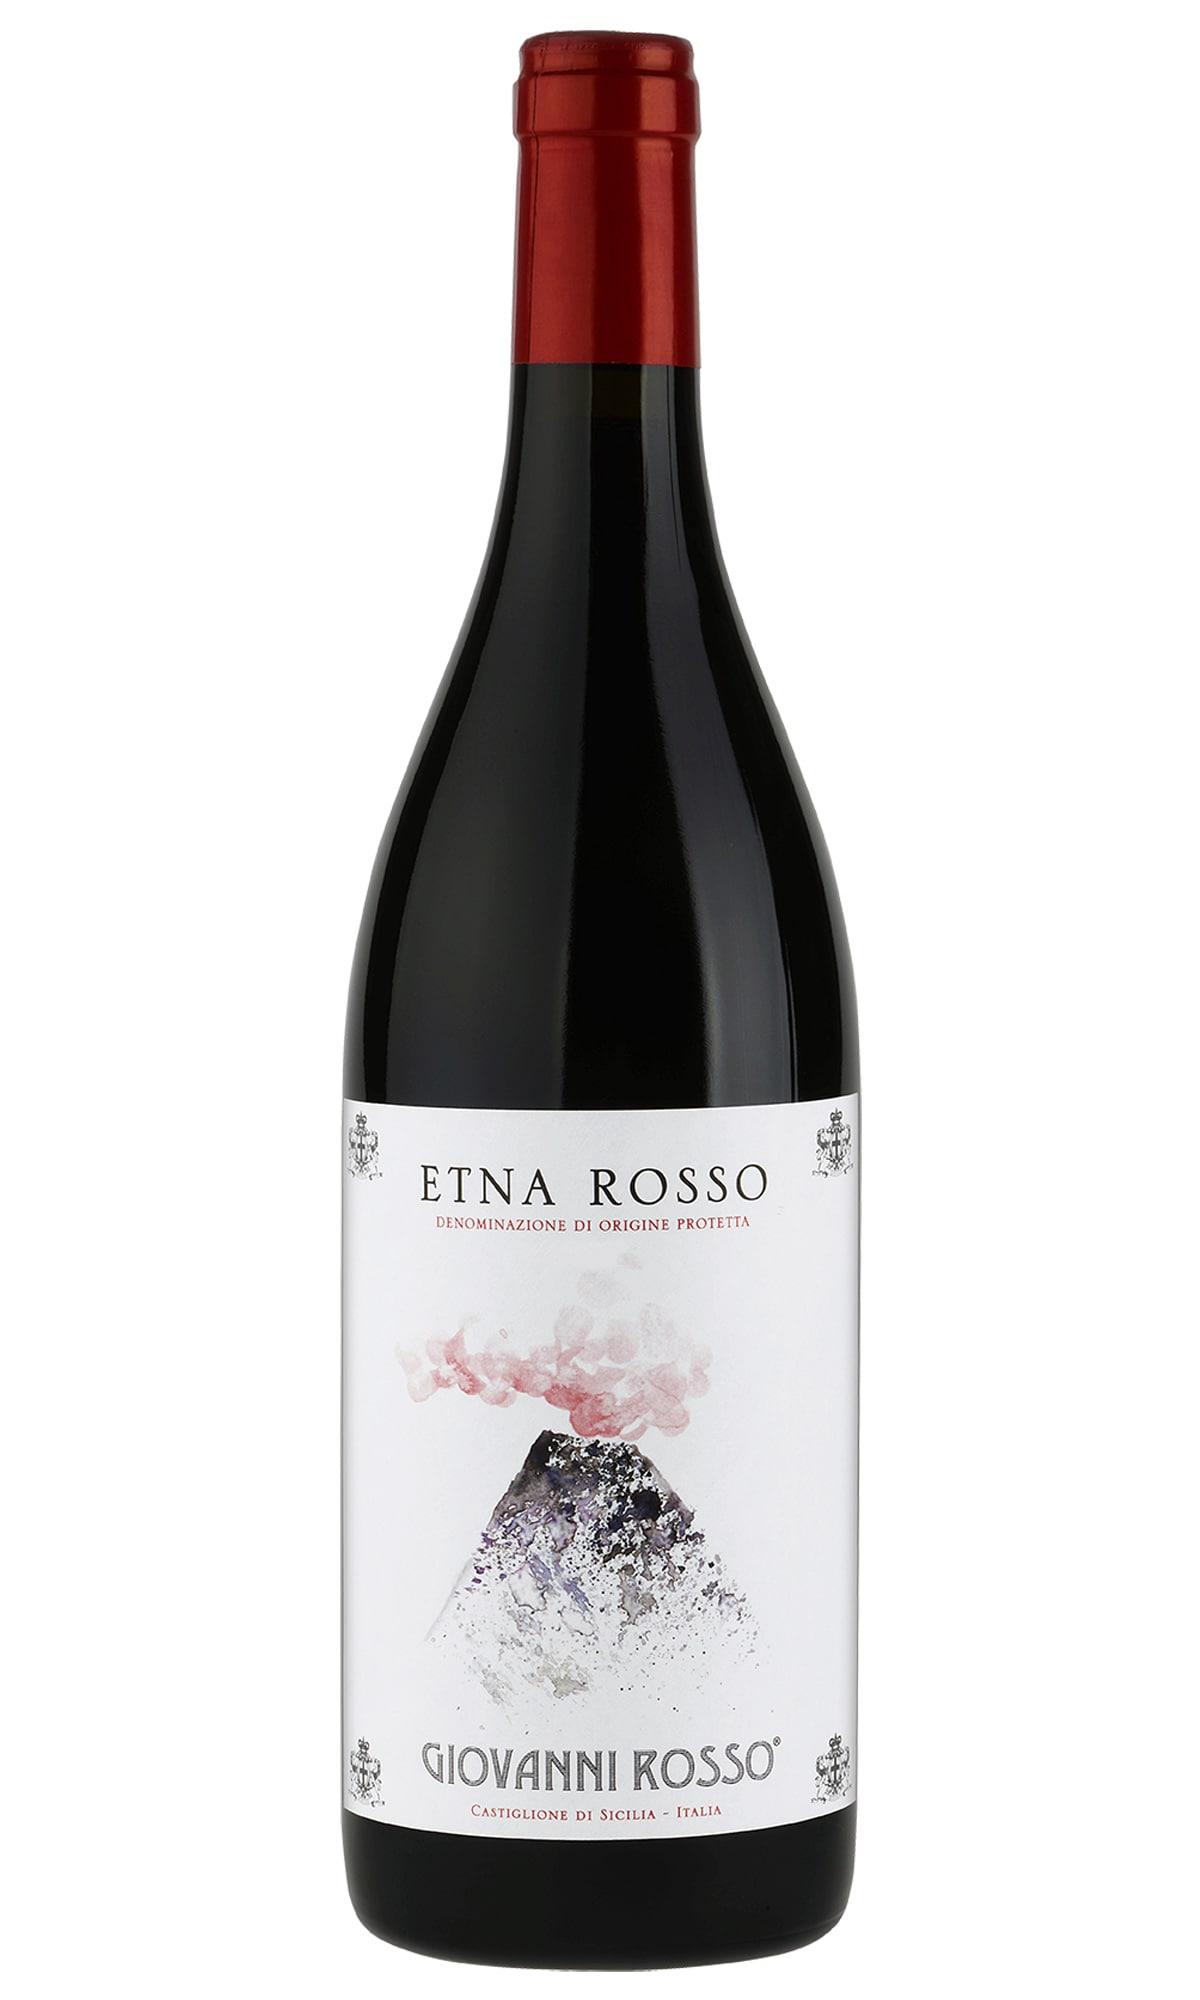 Etna Rosso - Contrada Montedolce DOC